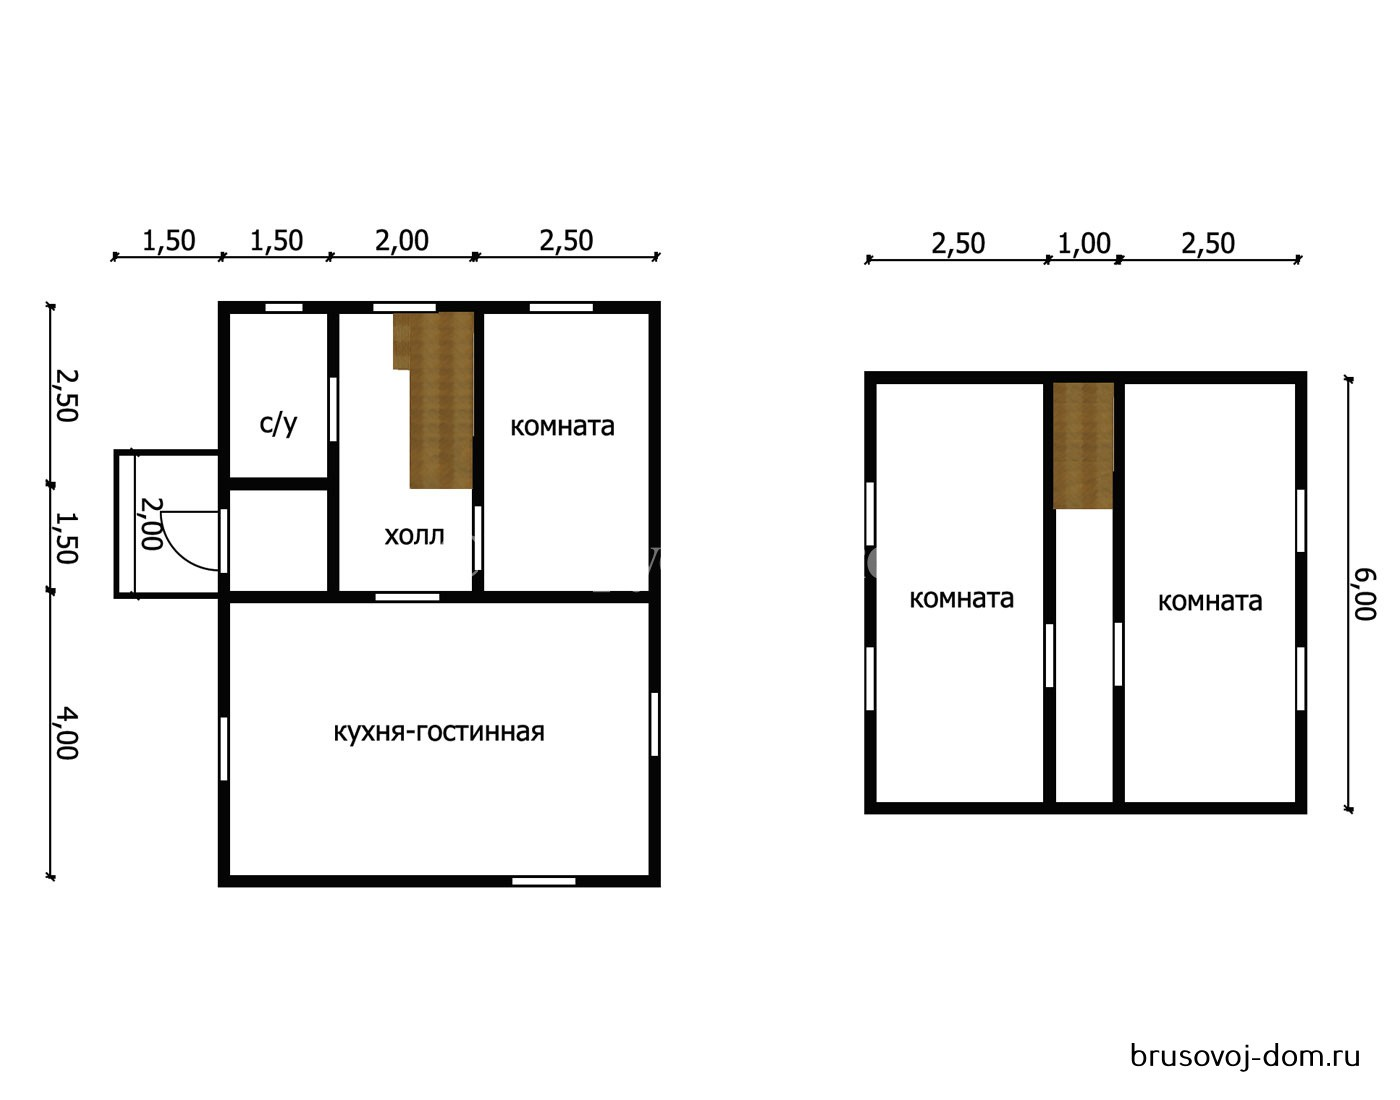 Дом под усадку Отрадное 6х8 м